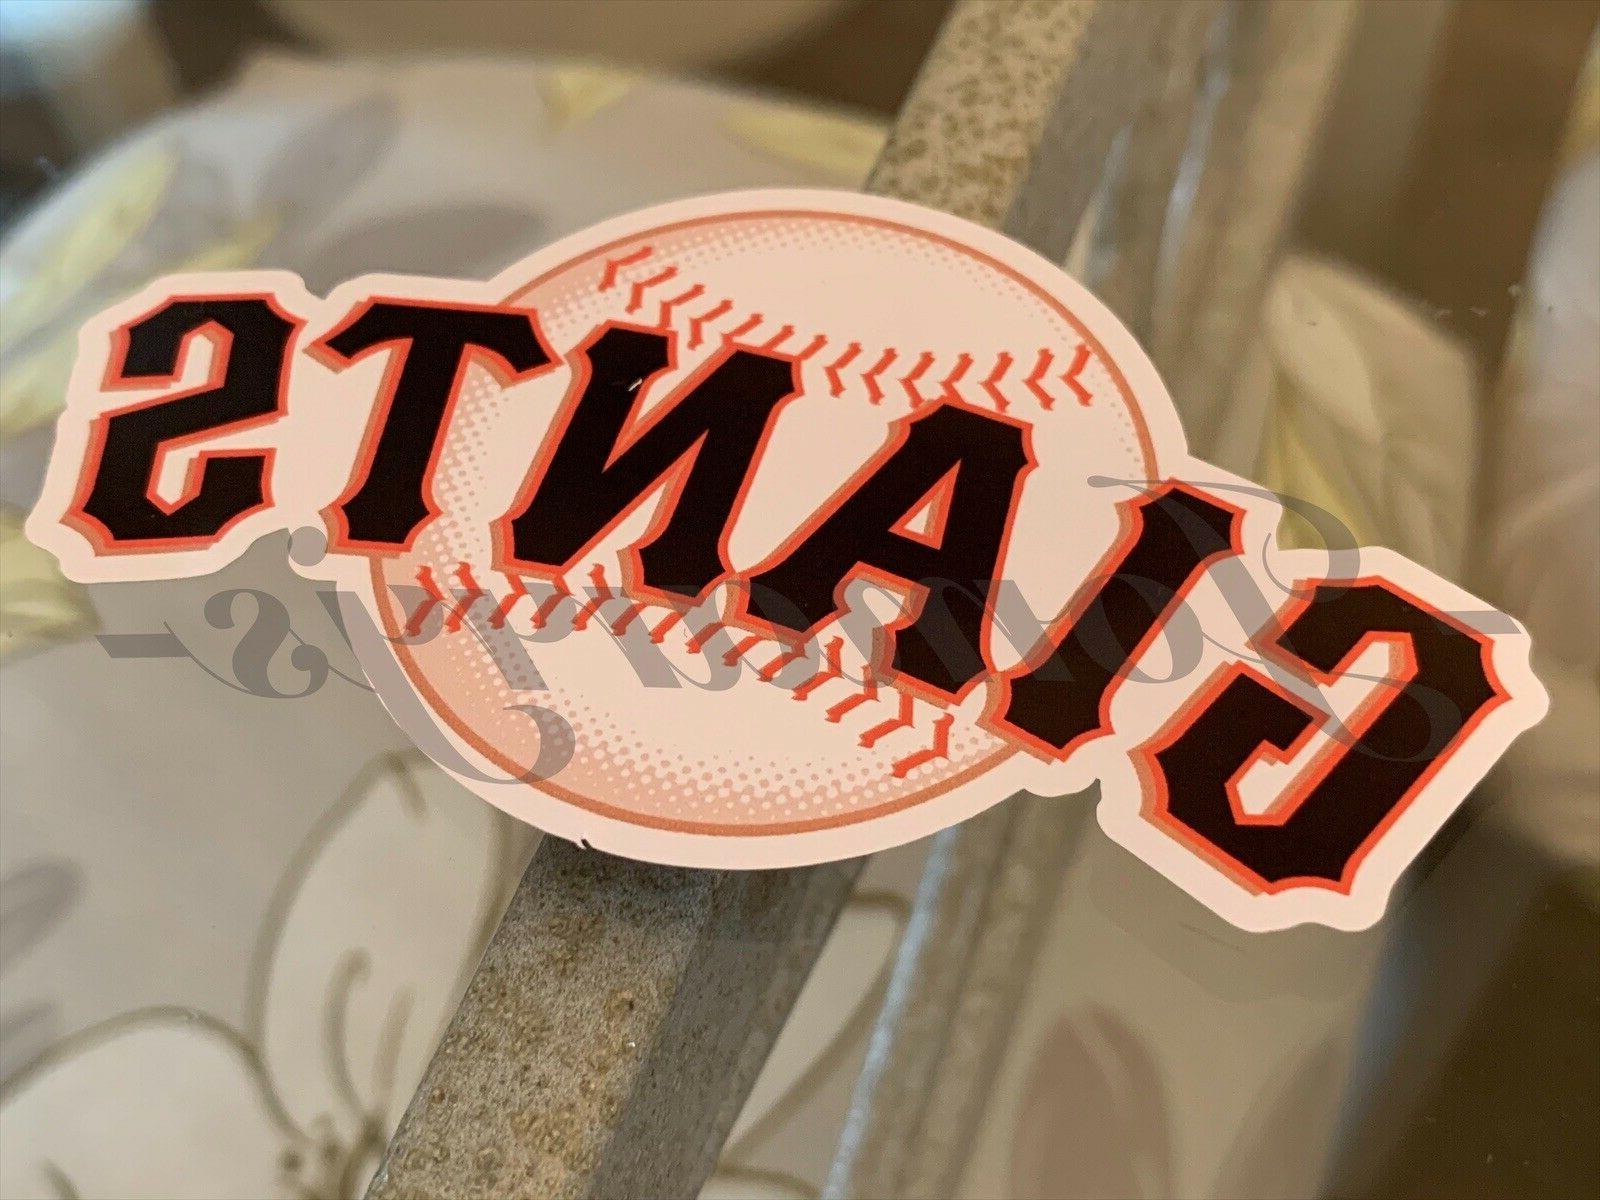 san francisco giants baseball team logo mlb